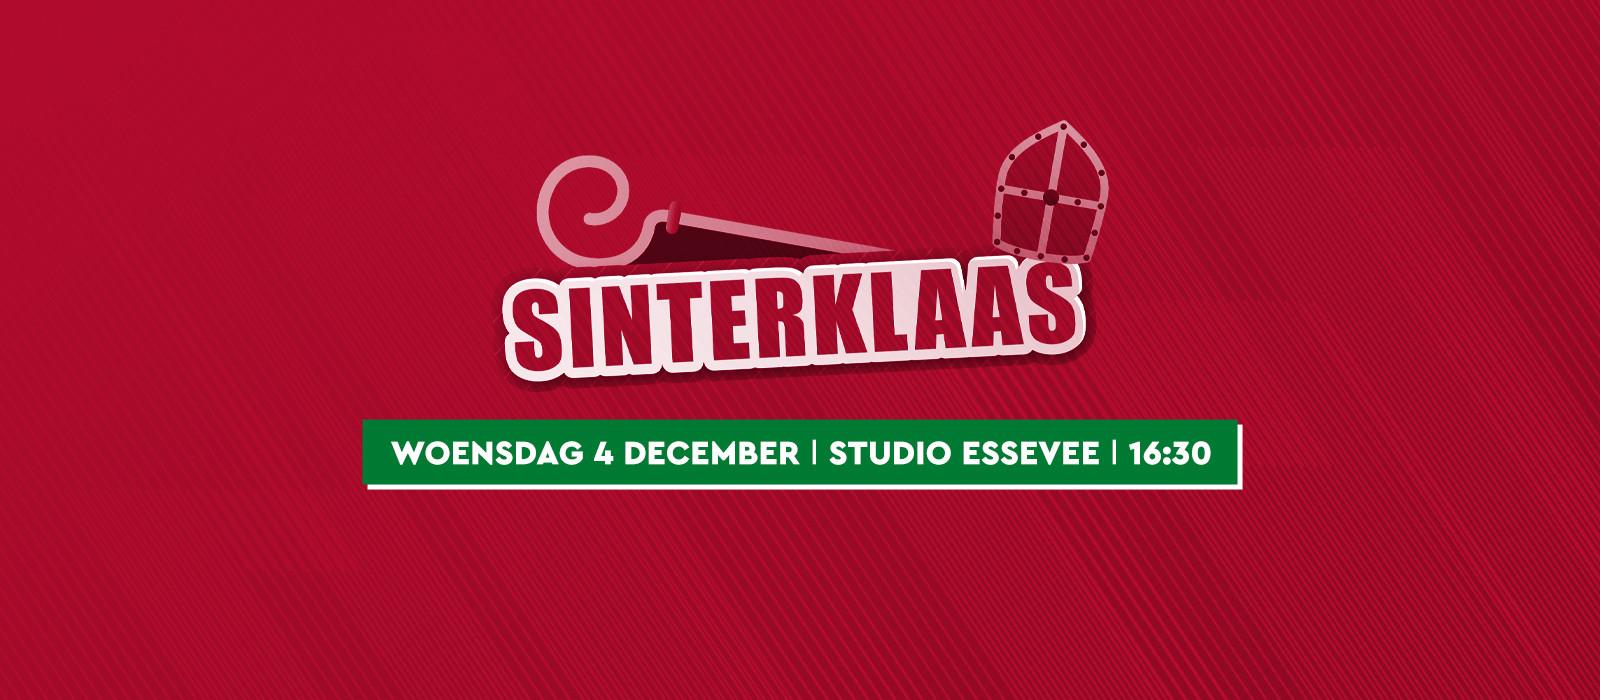 Banner_Sinterklaas_2019.jpg